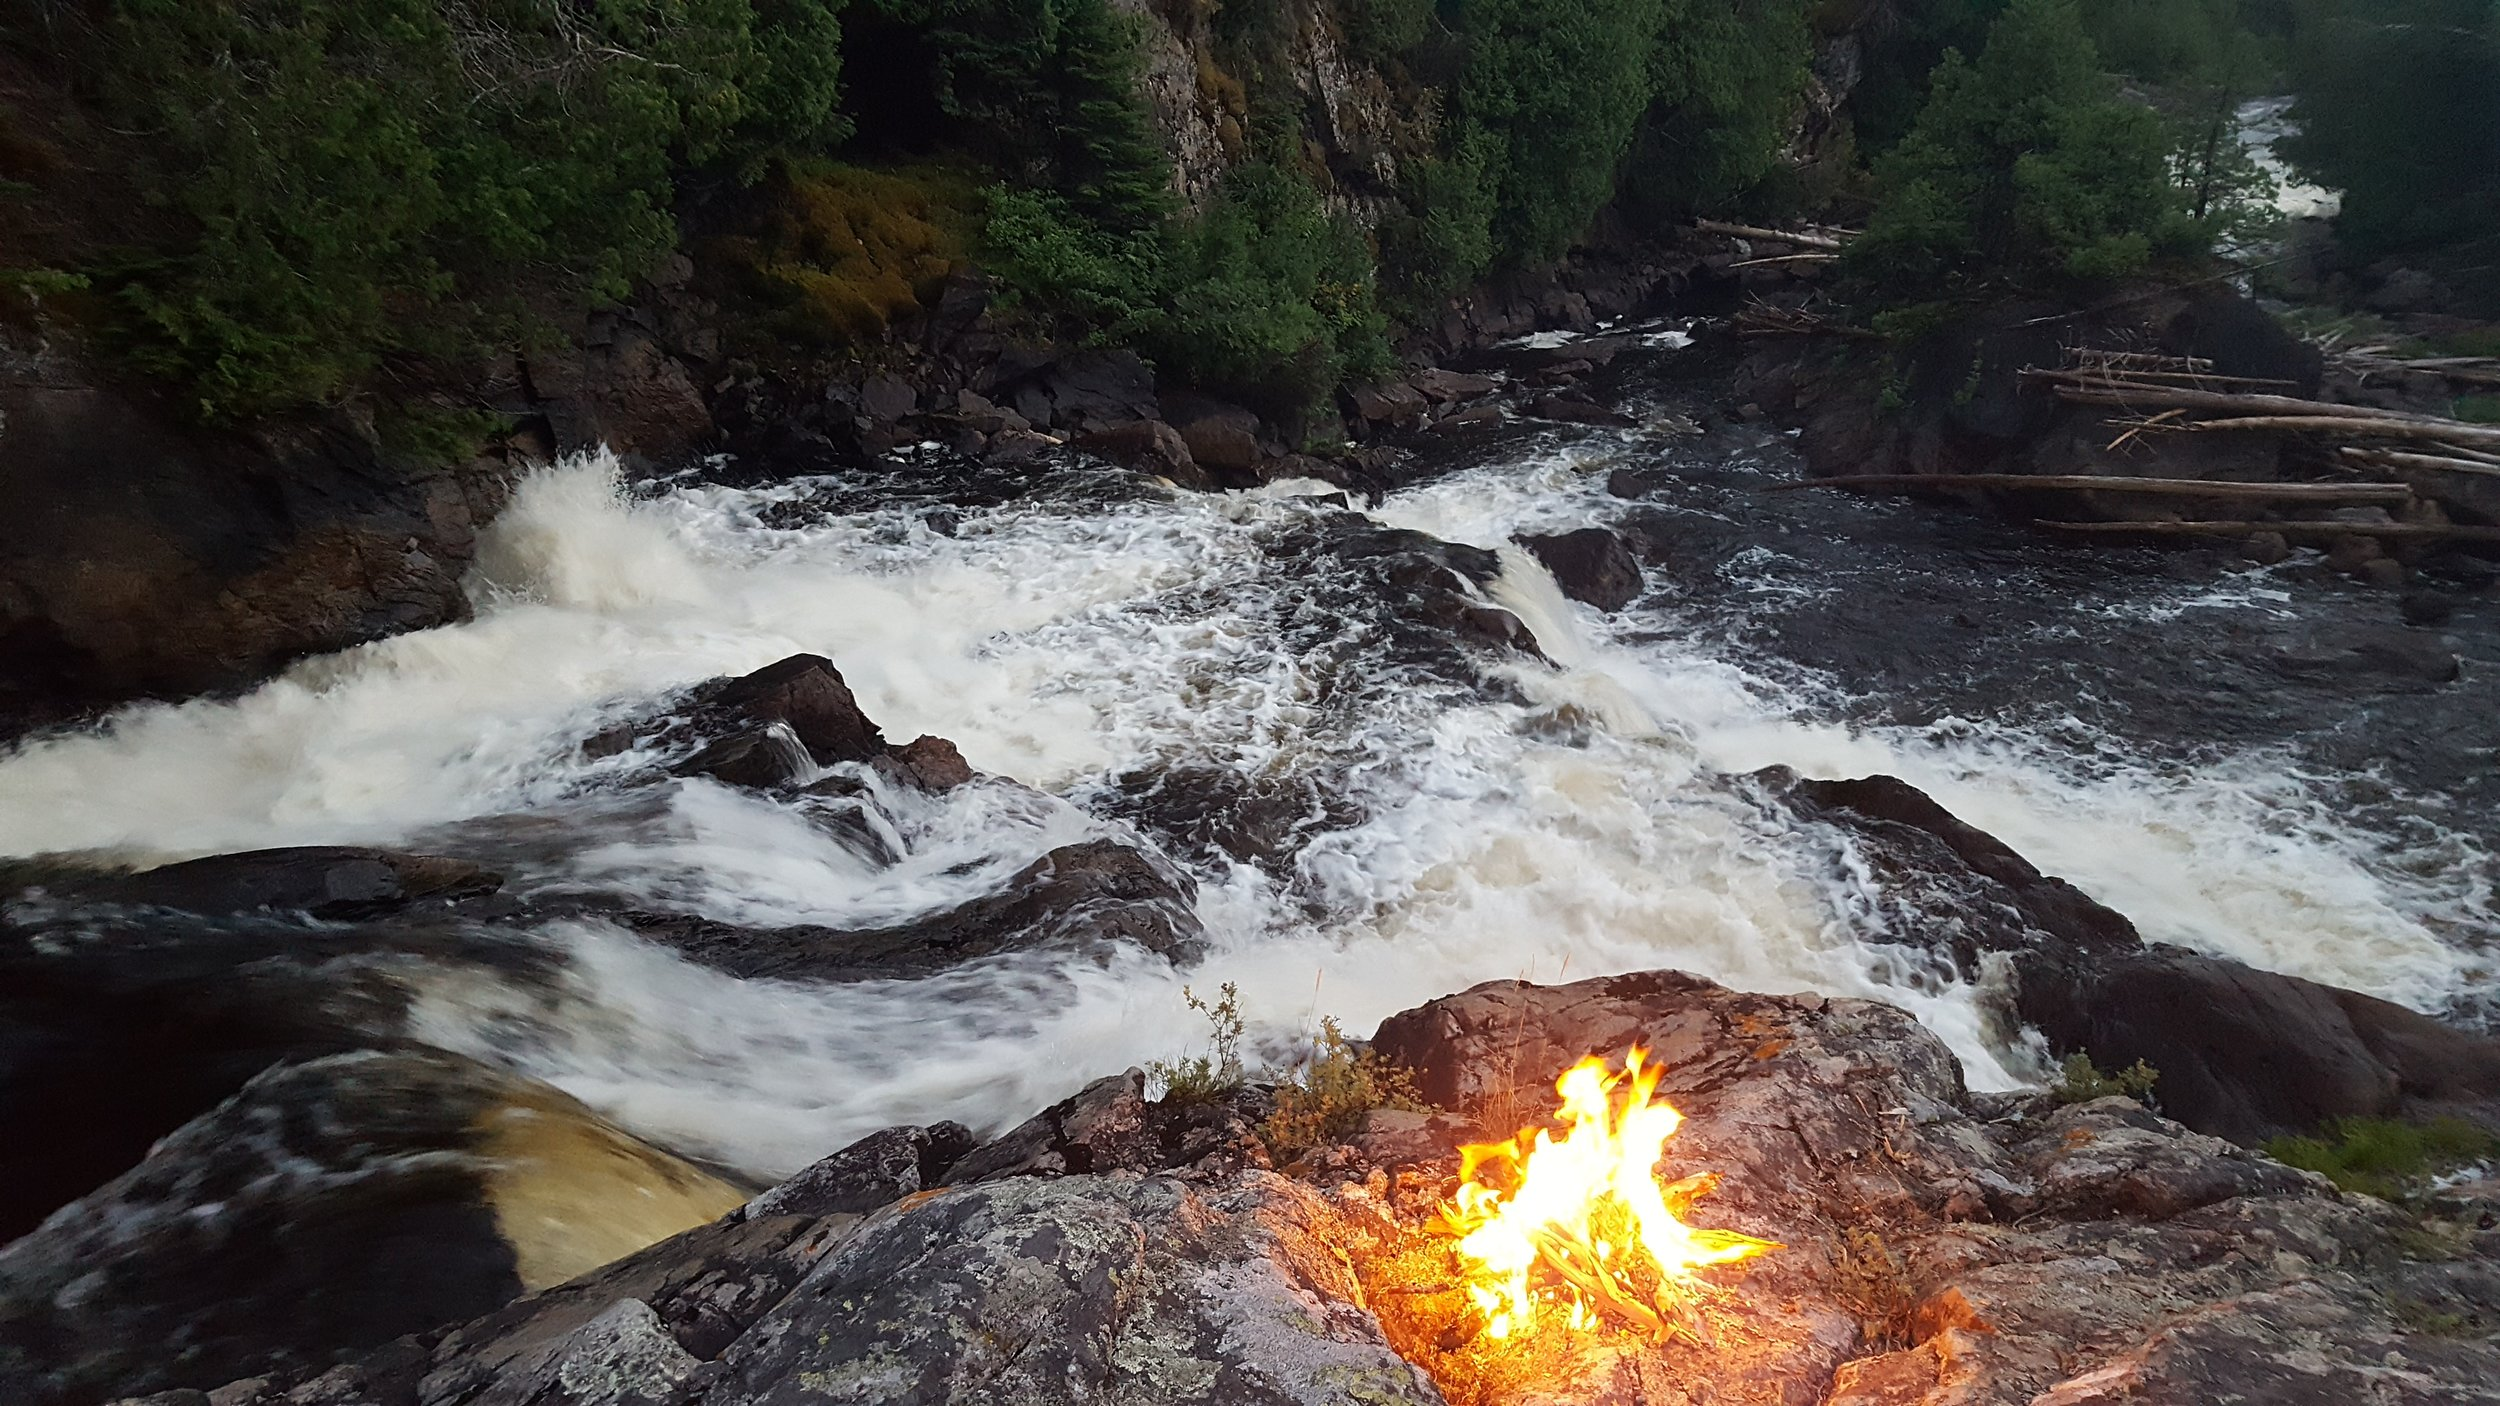 Campfire at Rainbow Falls - Steel River